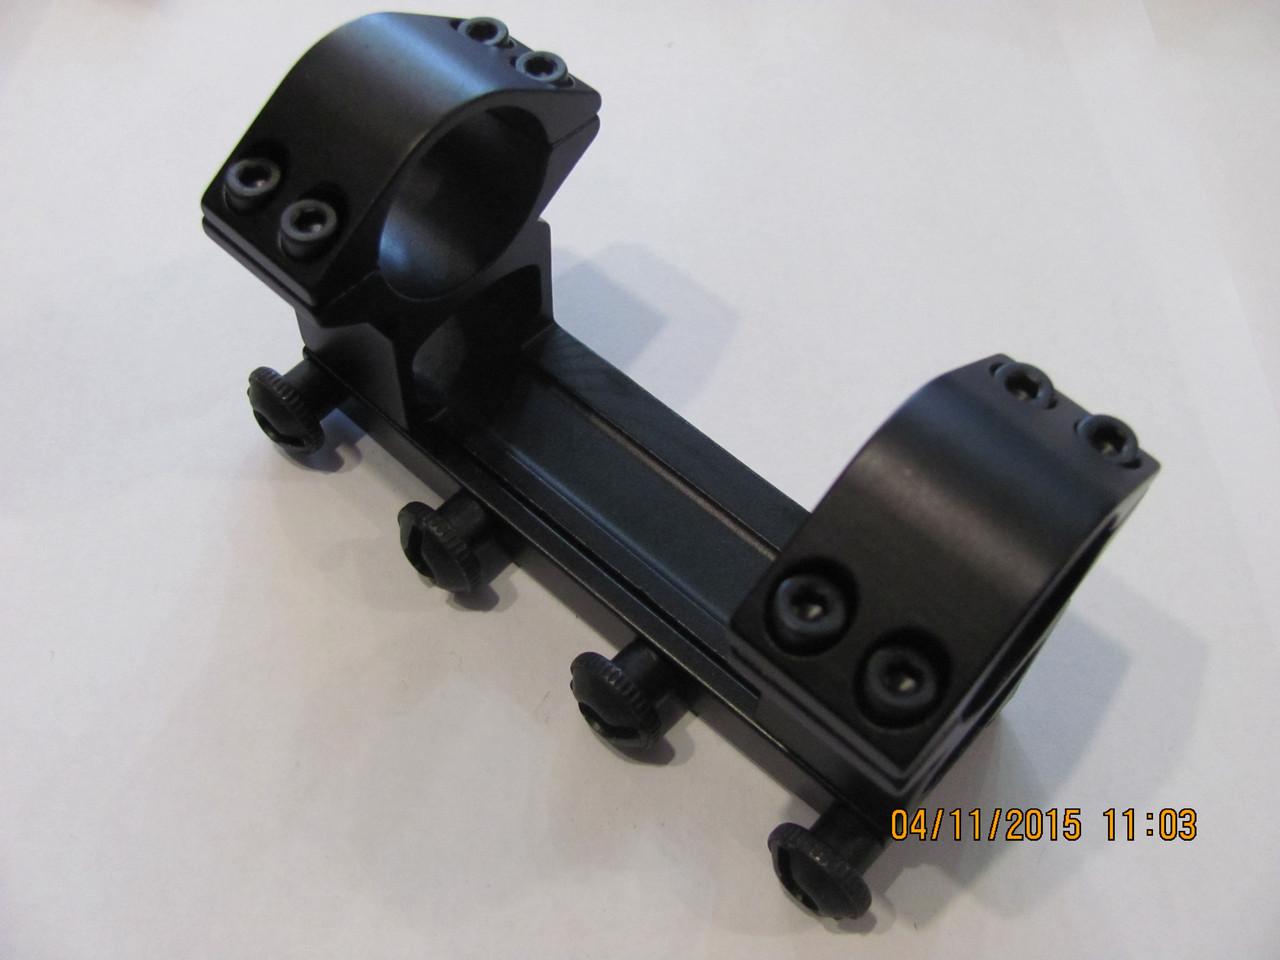 Моноблок для крепления оптики 25 мм, на вивер